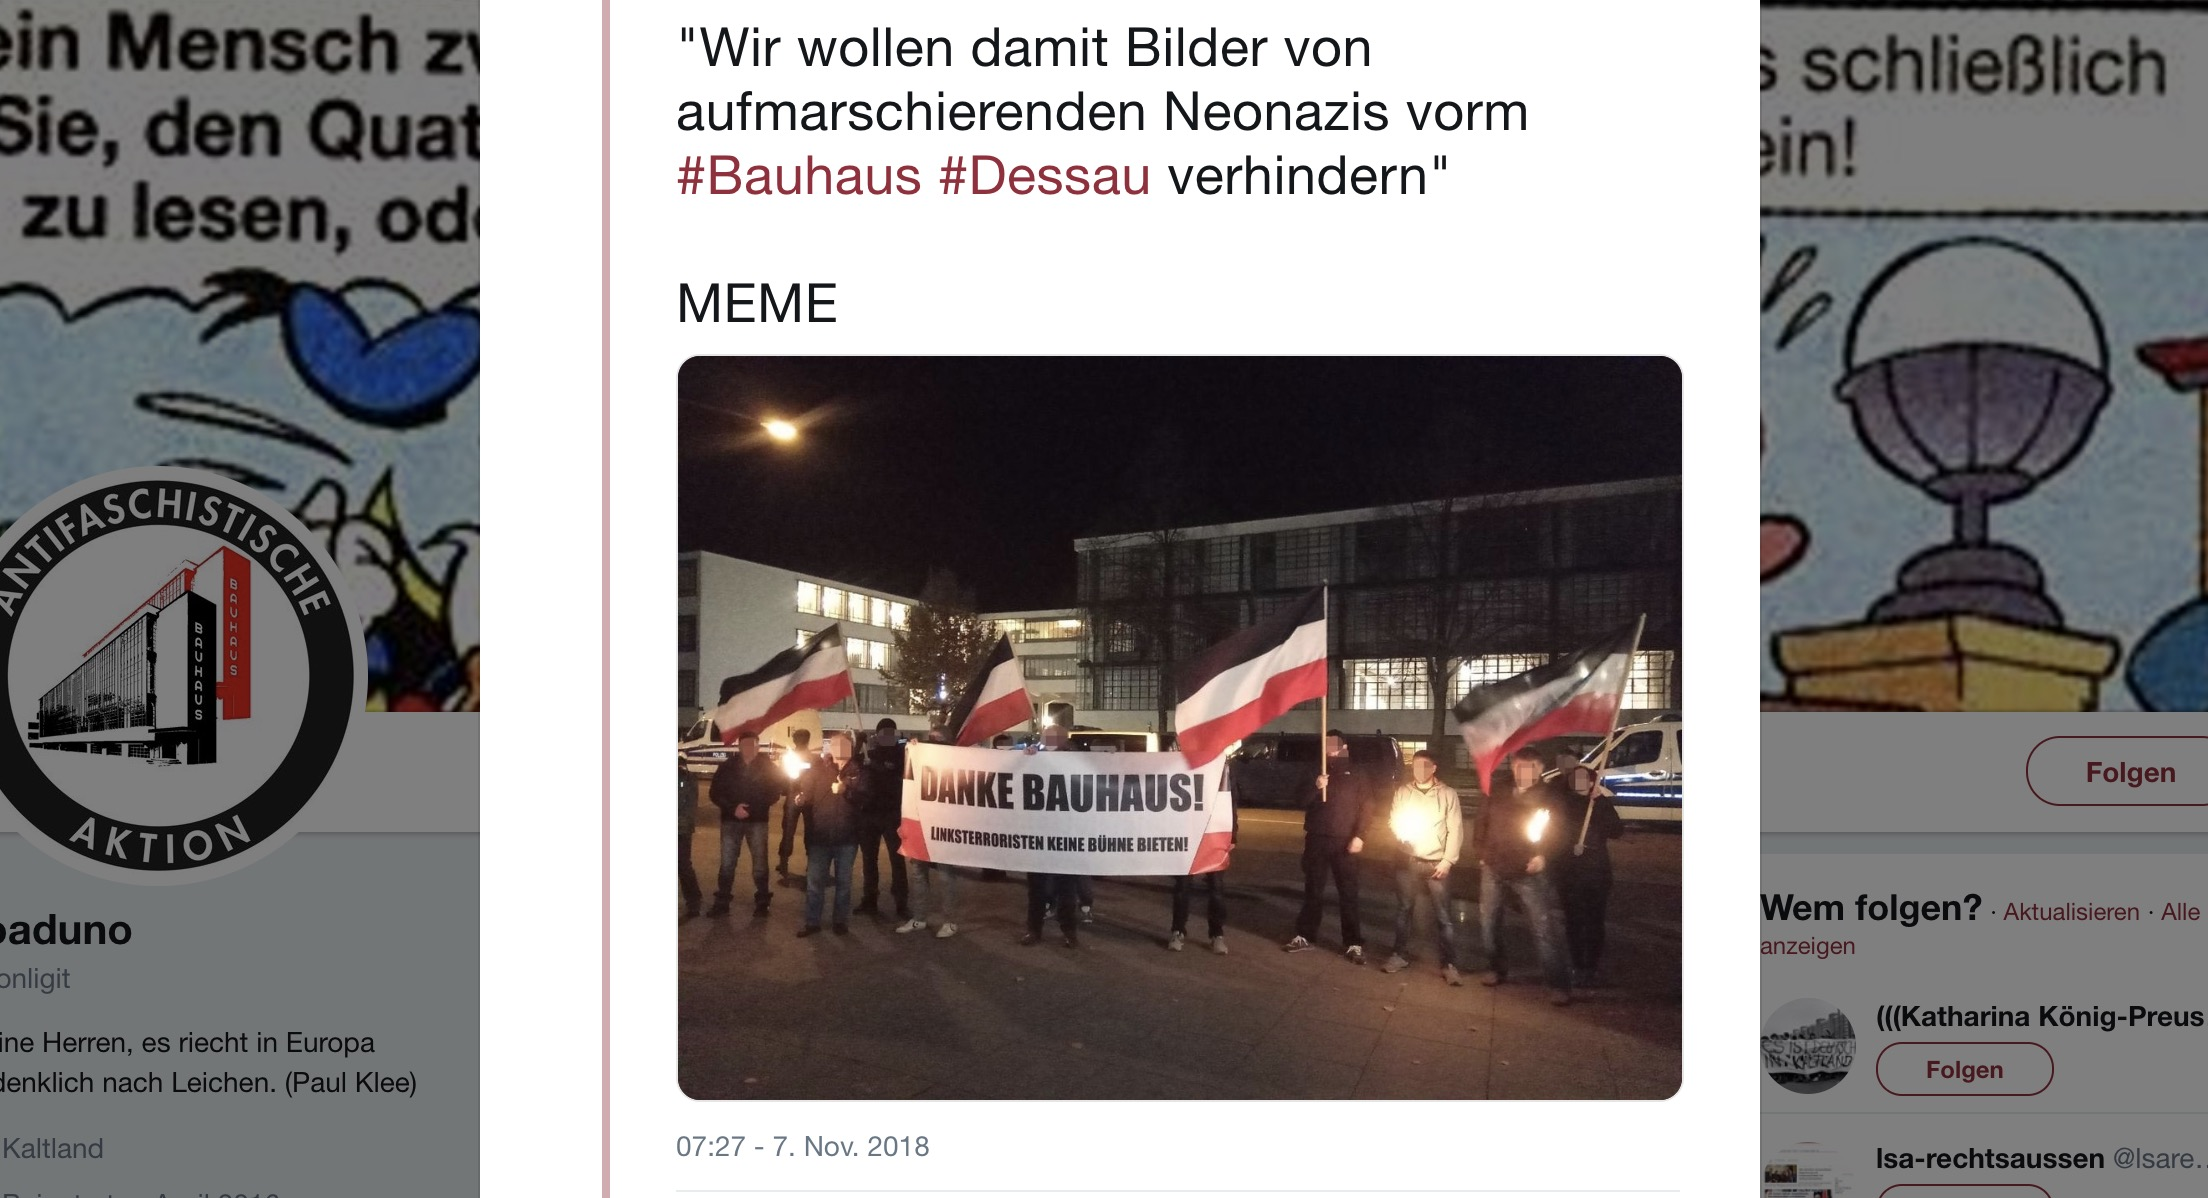 Alles falsch gemacht: Nazis bedanken sich beim Bauhaus Dessau